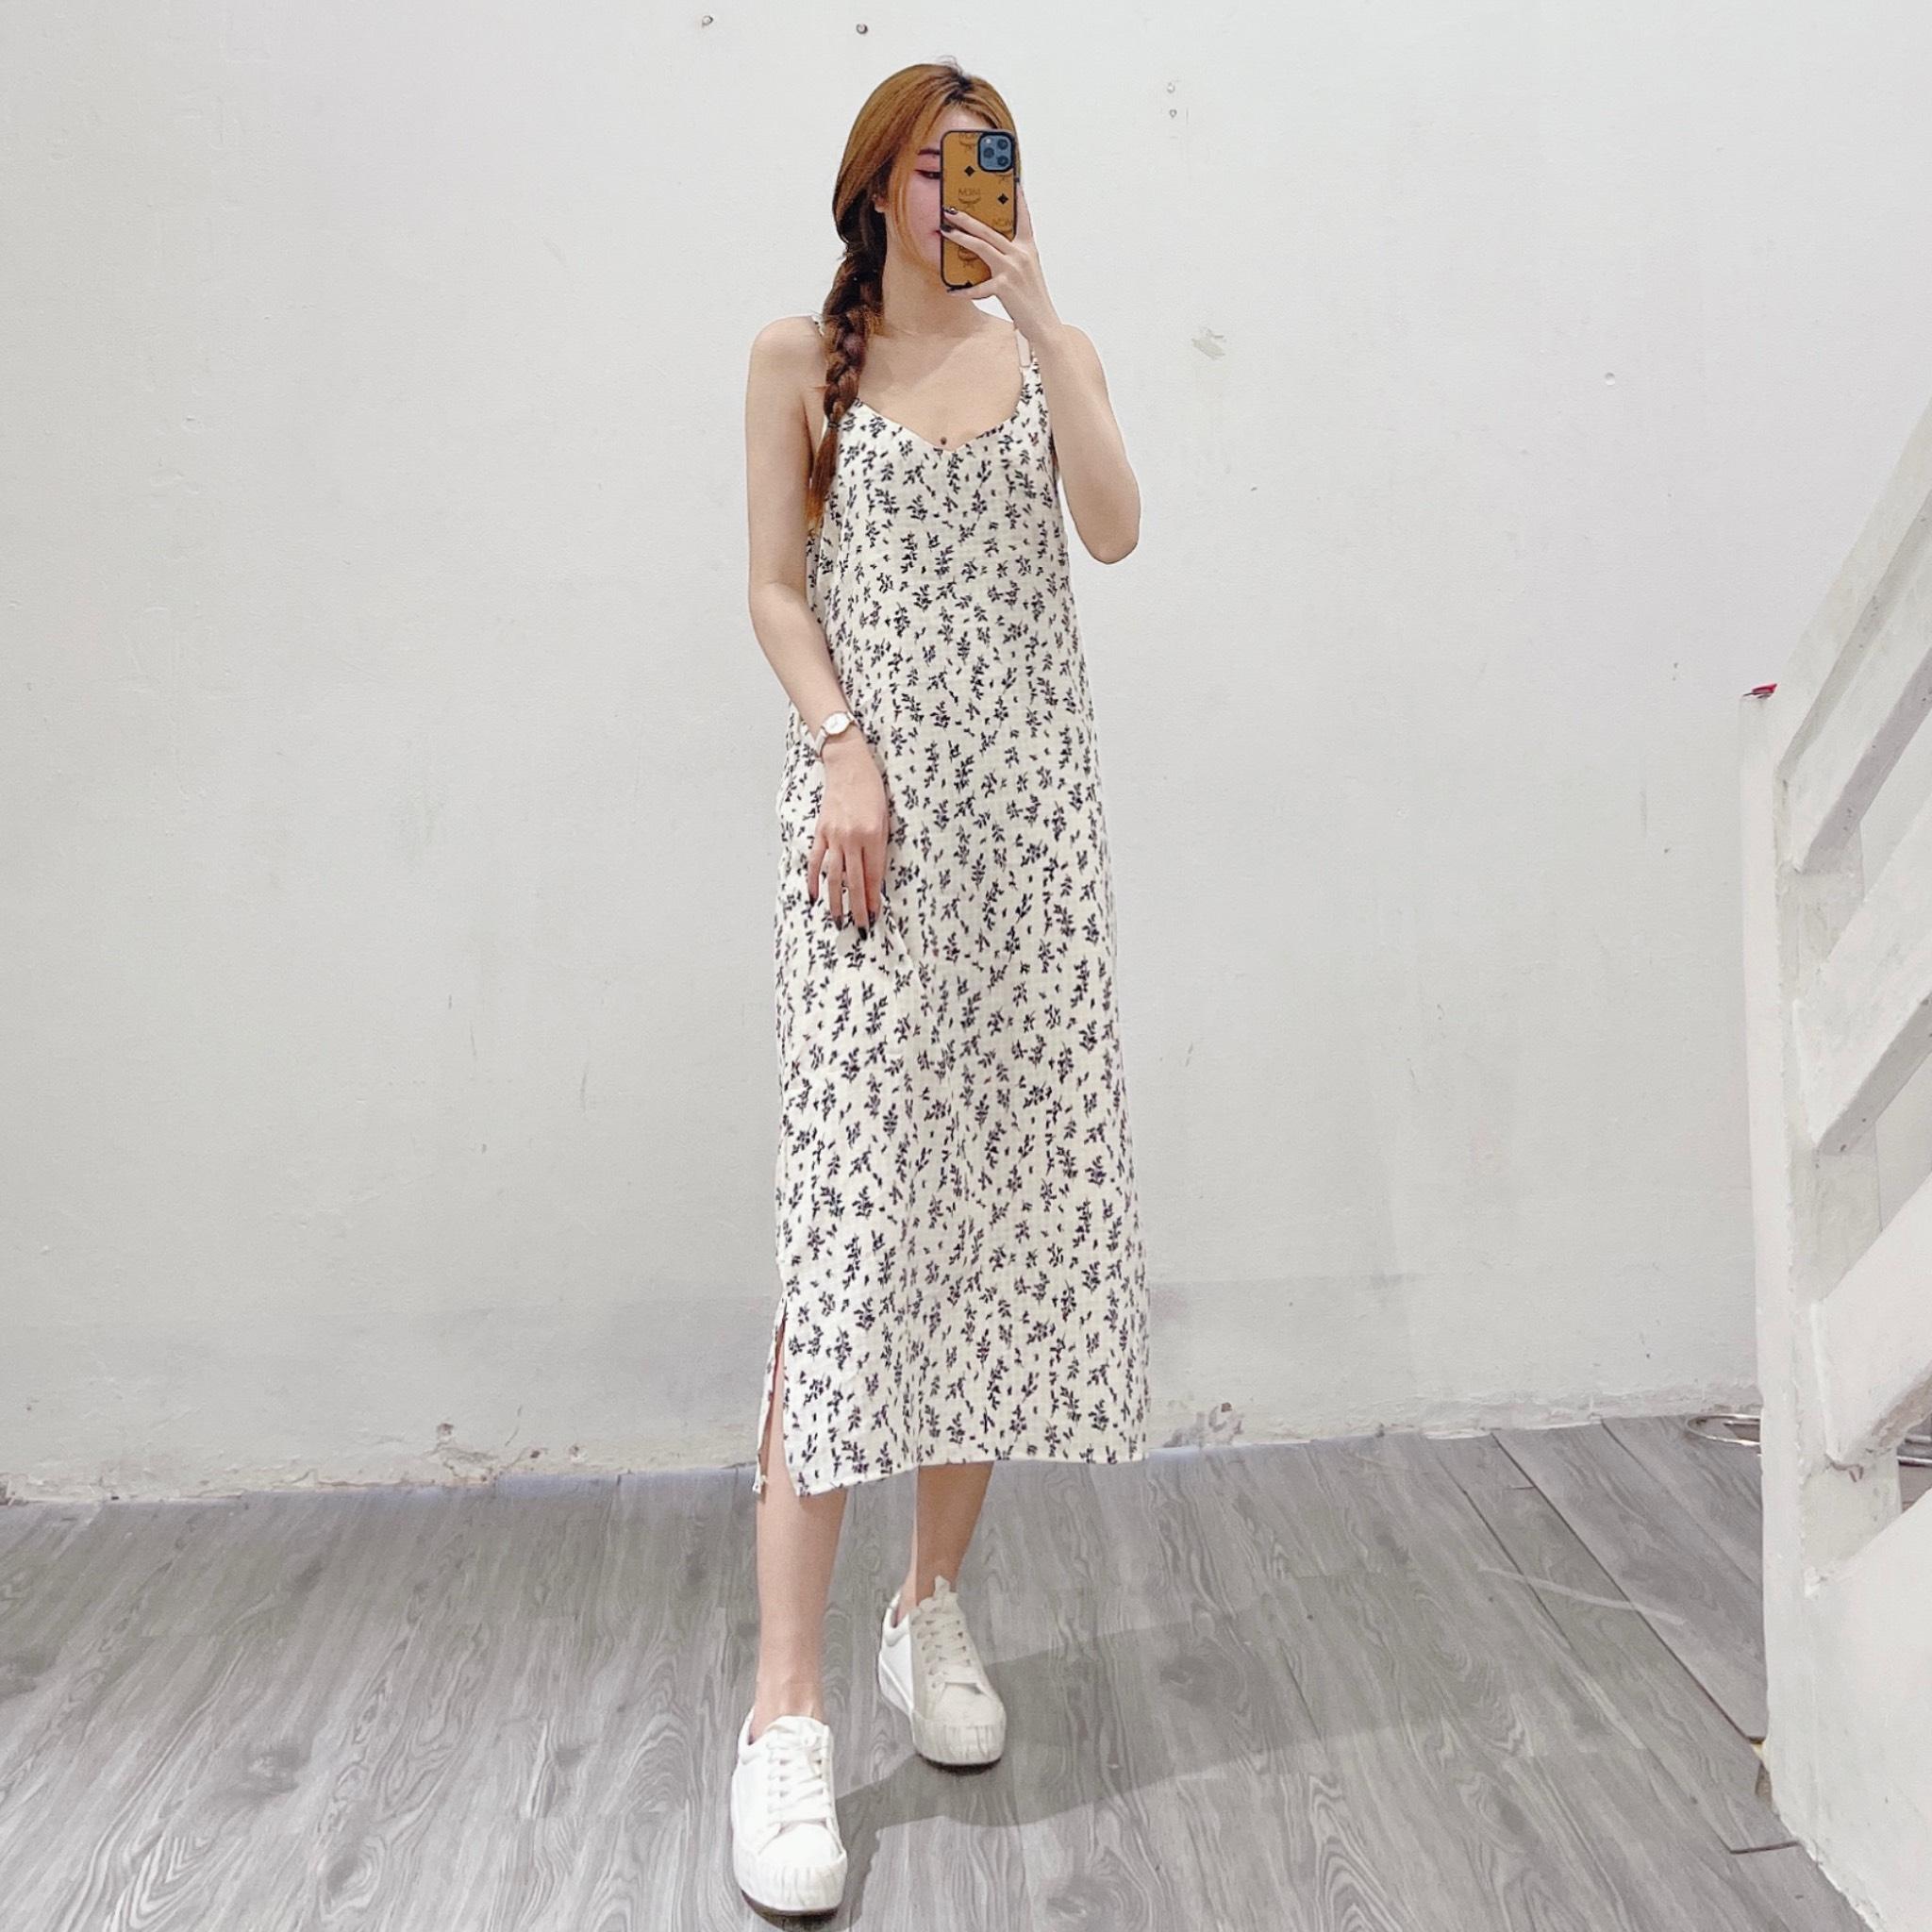 Váy 2 Dây Hoa Nhí V2157 - NB/T1/K7